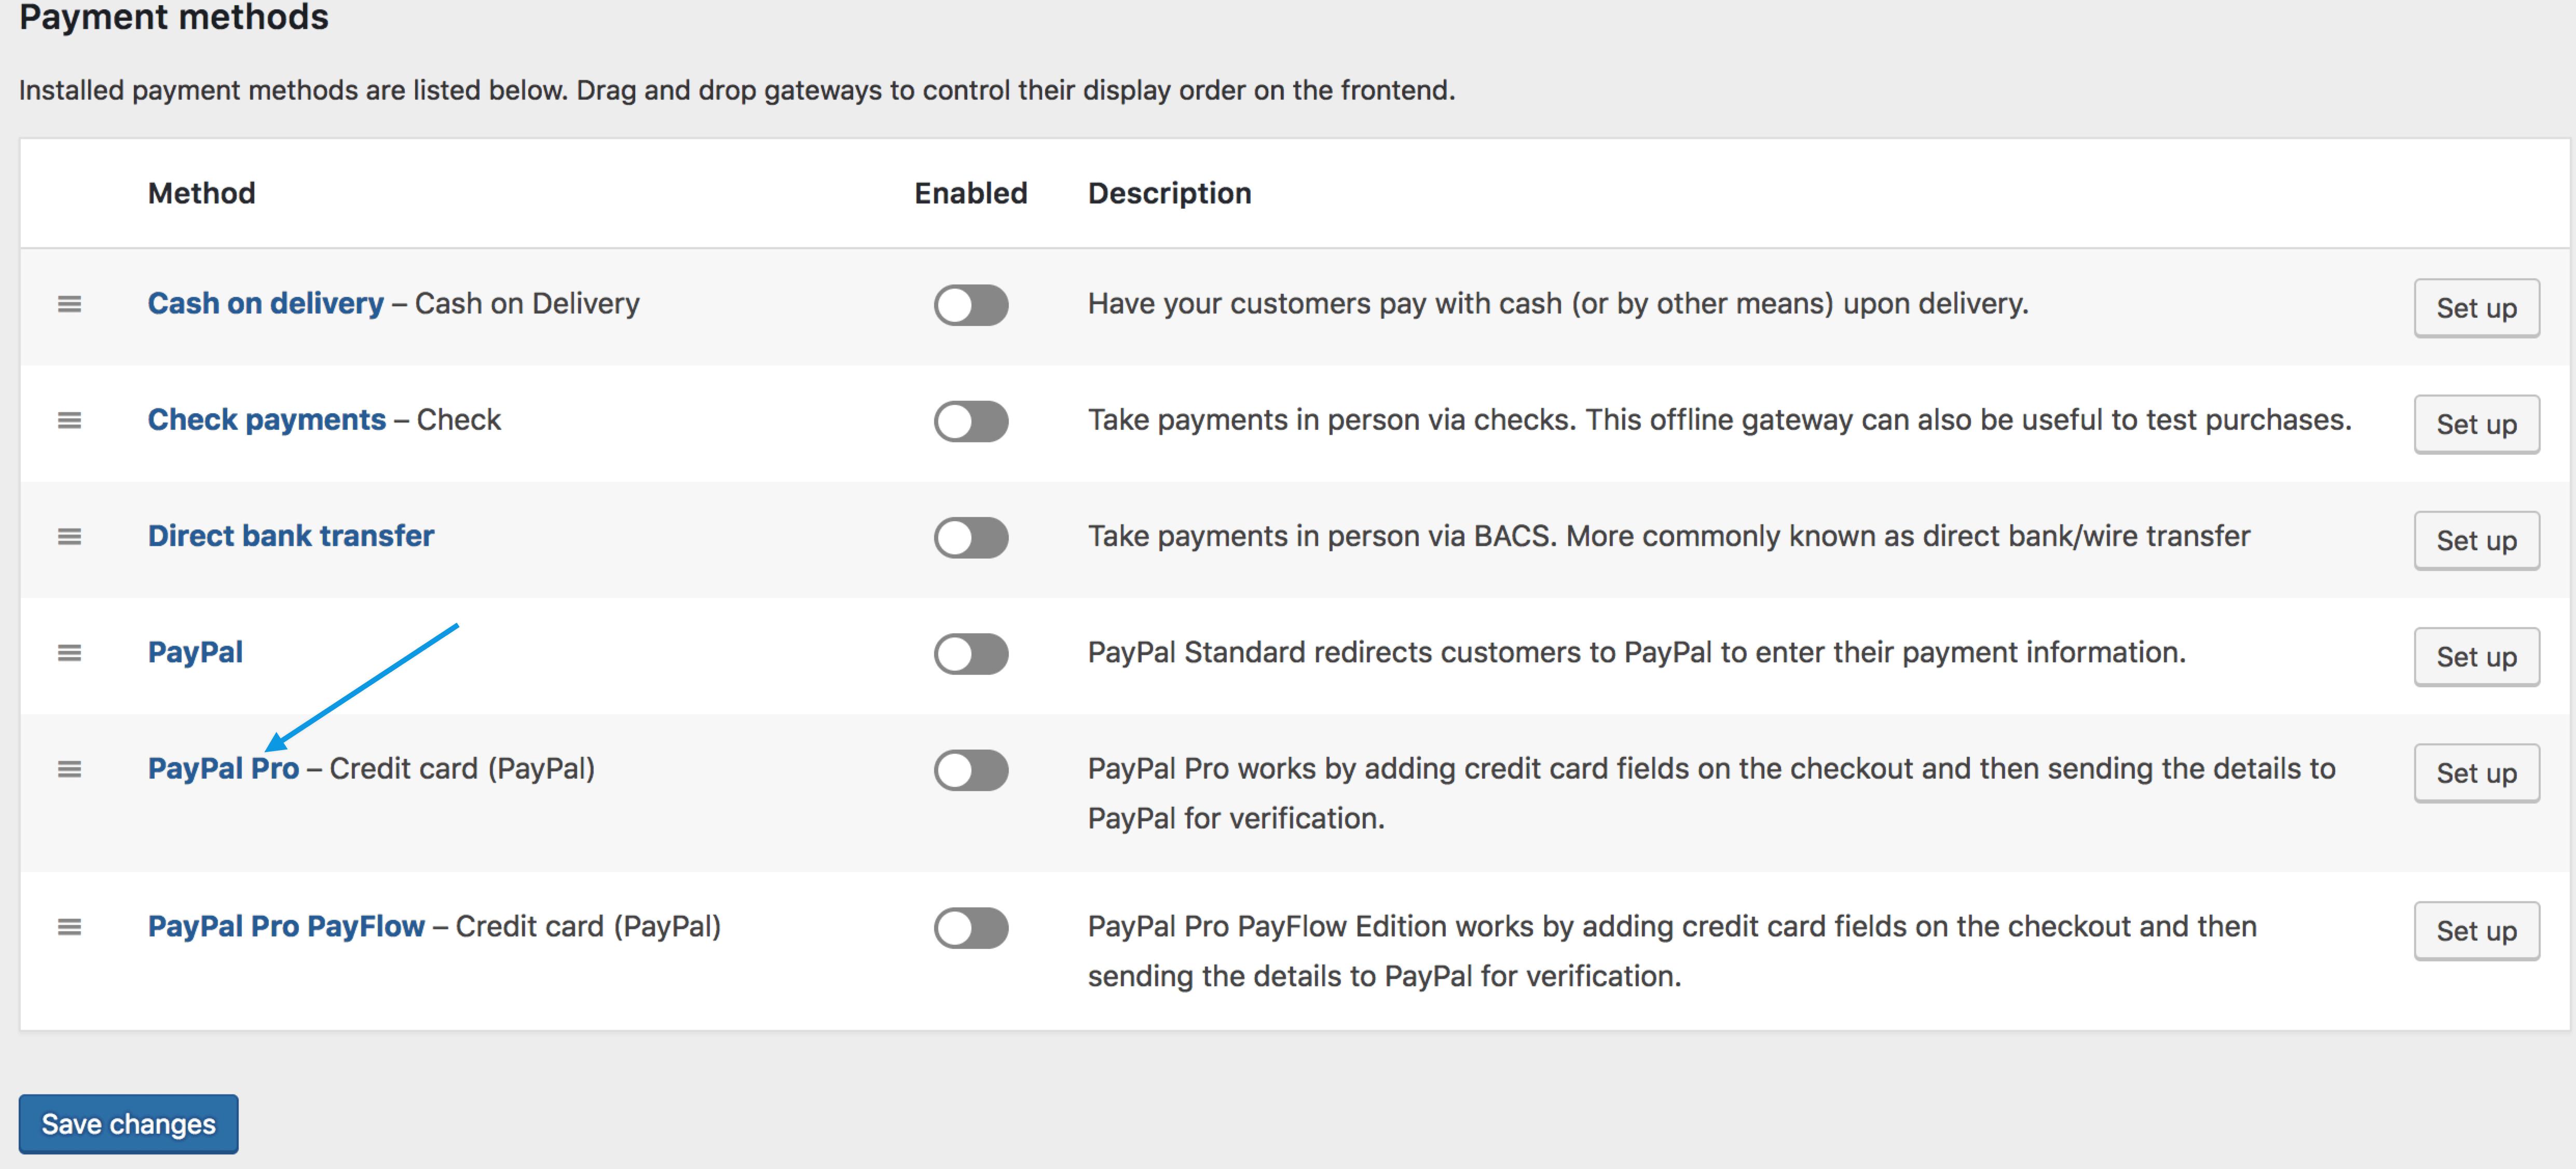 PayPal Pro - WooCommerce Docs